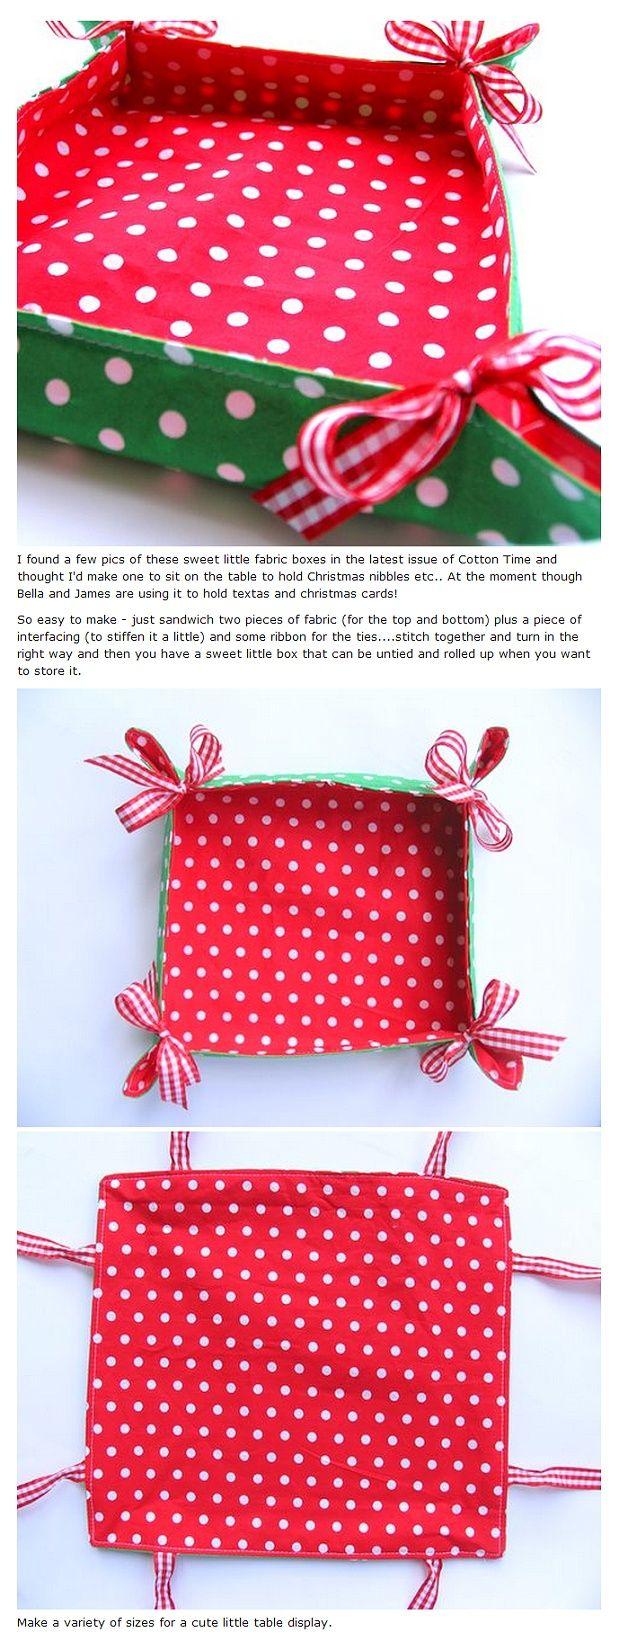 Cute box idea to hold Christmas cards, snacks, etc